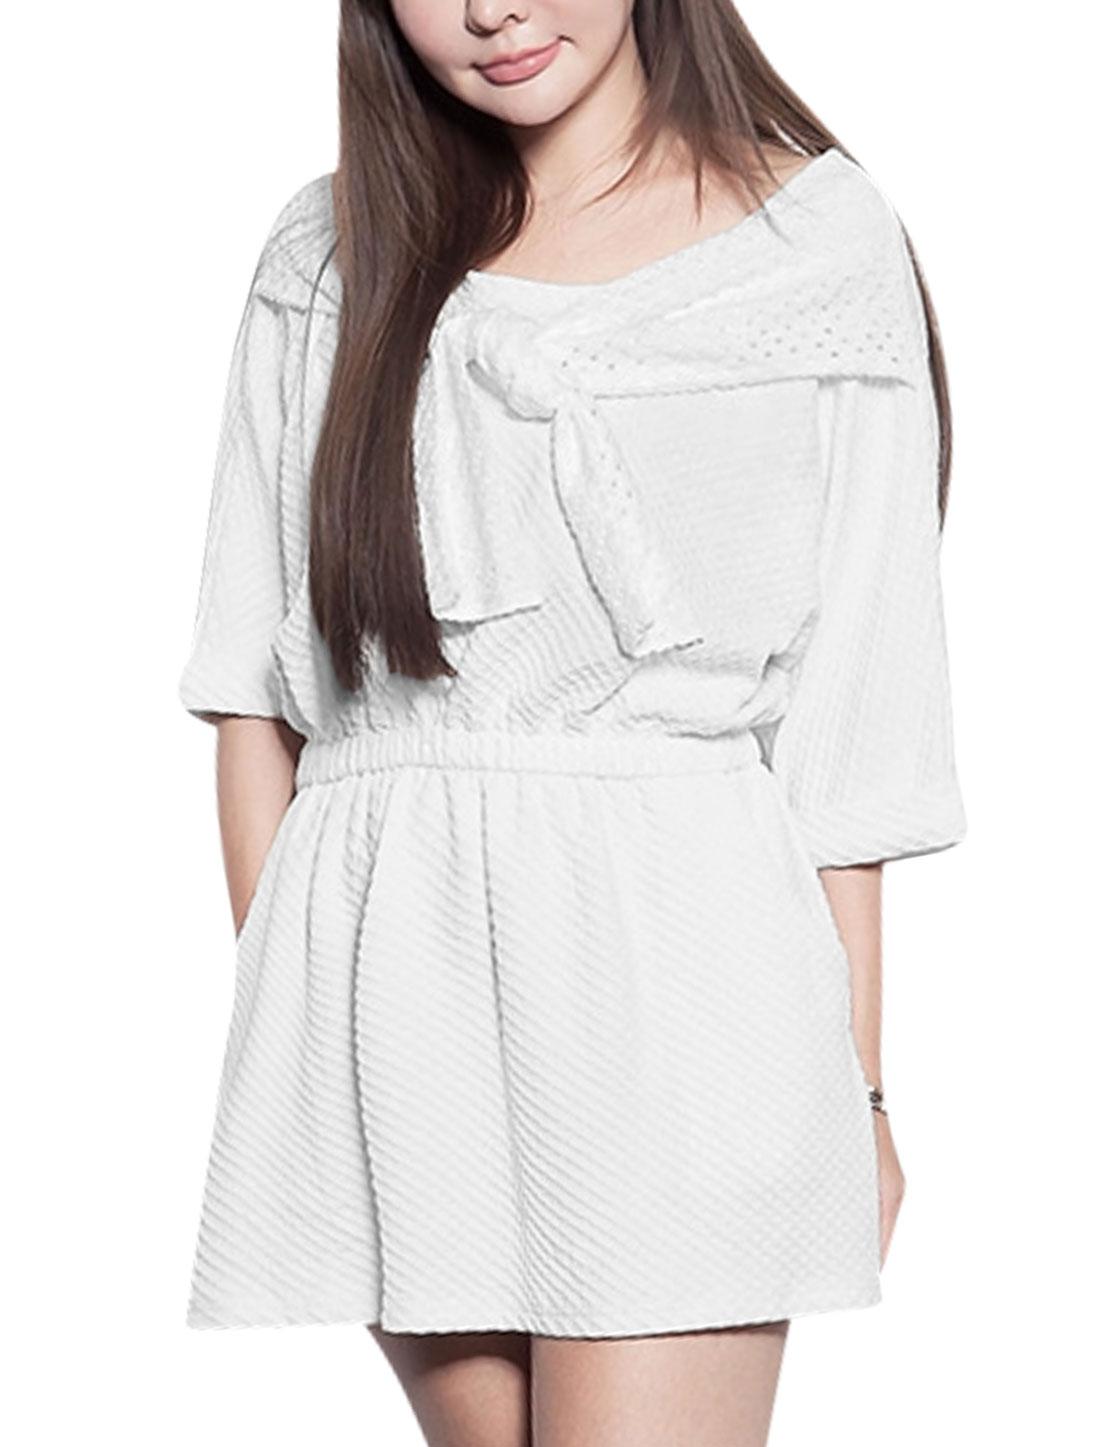 Women Round Neck Elbow Sleeves Elastic Waist Texture Design Tunic Dress White S